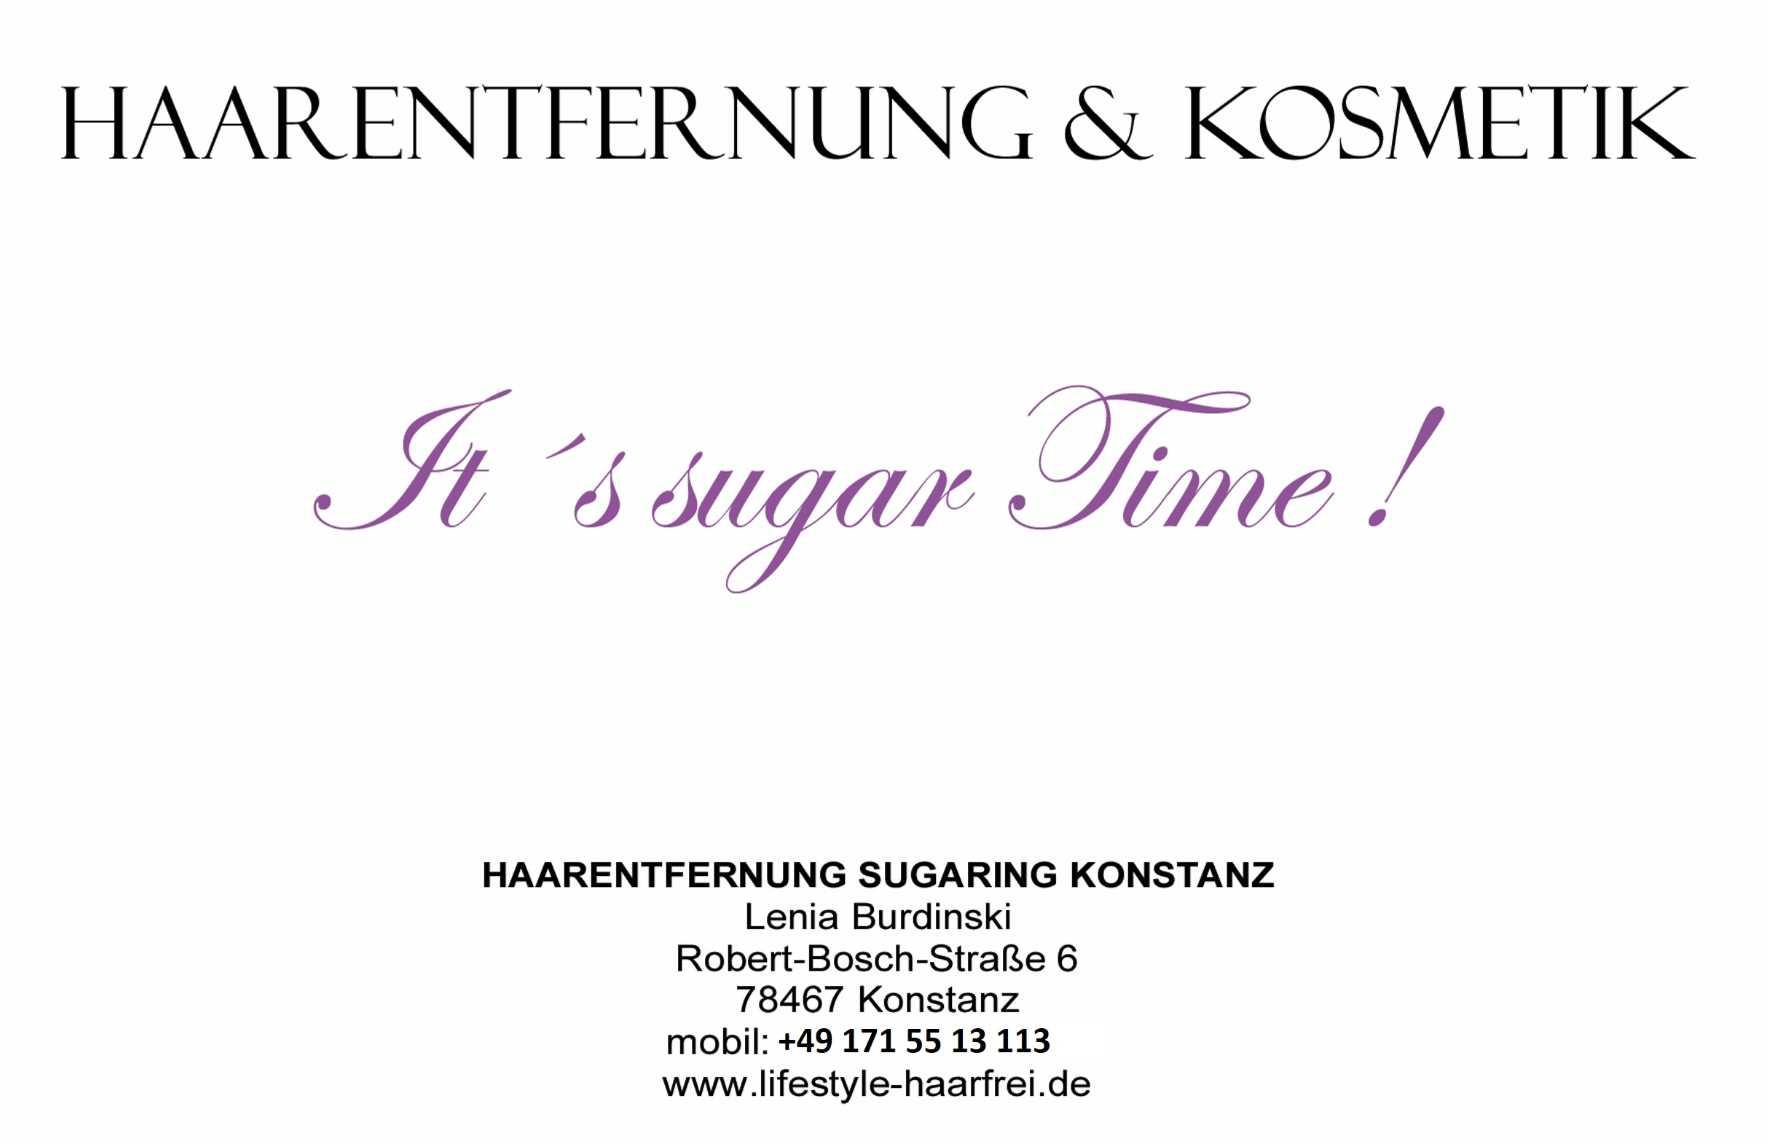 Waxing-Sugaring-Konstanz_Flyer-2016_2